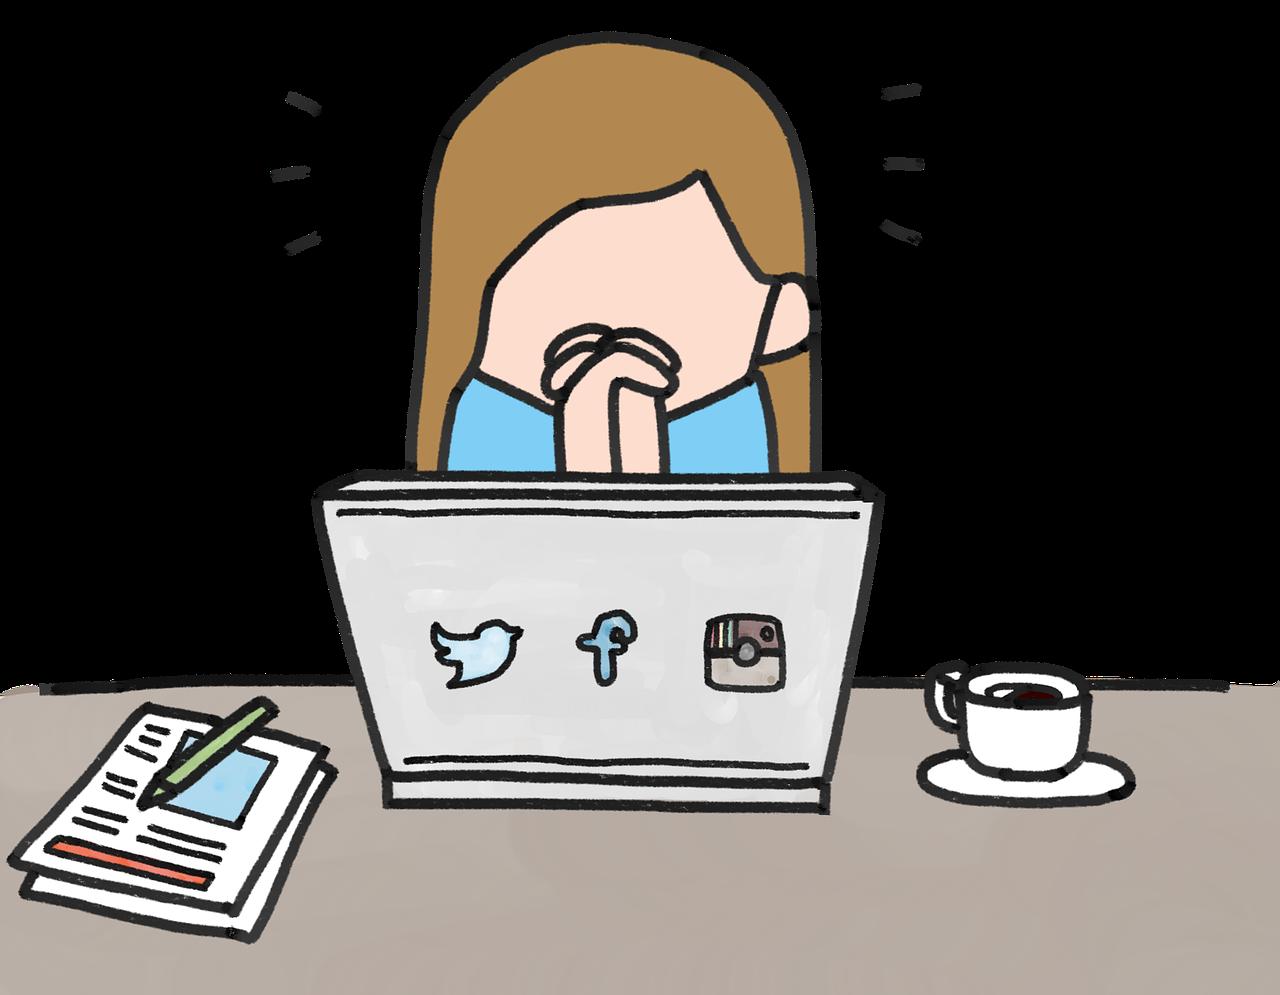 Worry clipart sensitive person. Social media exhaustion artefact